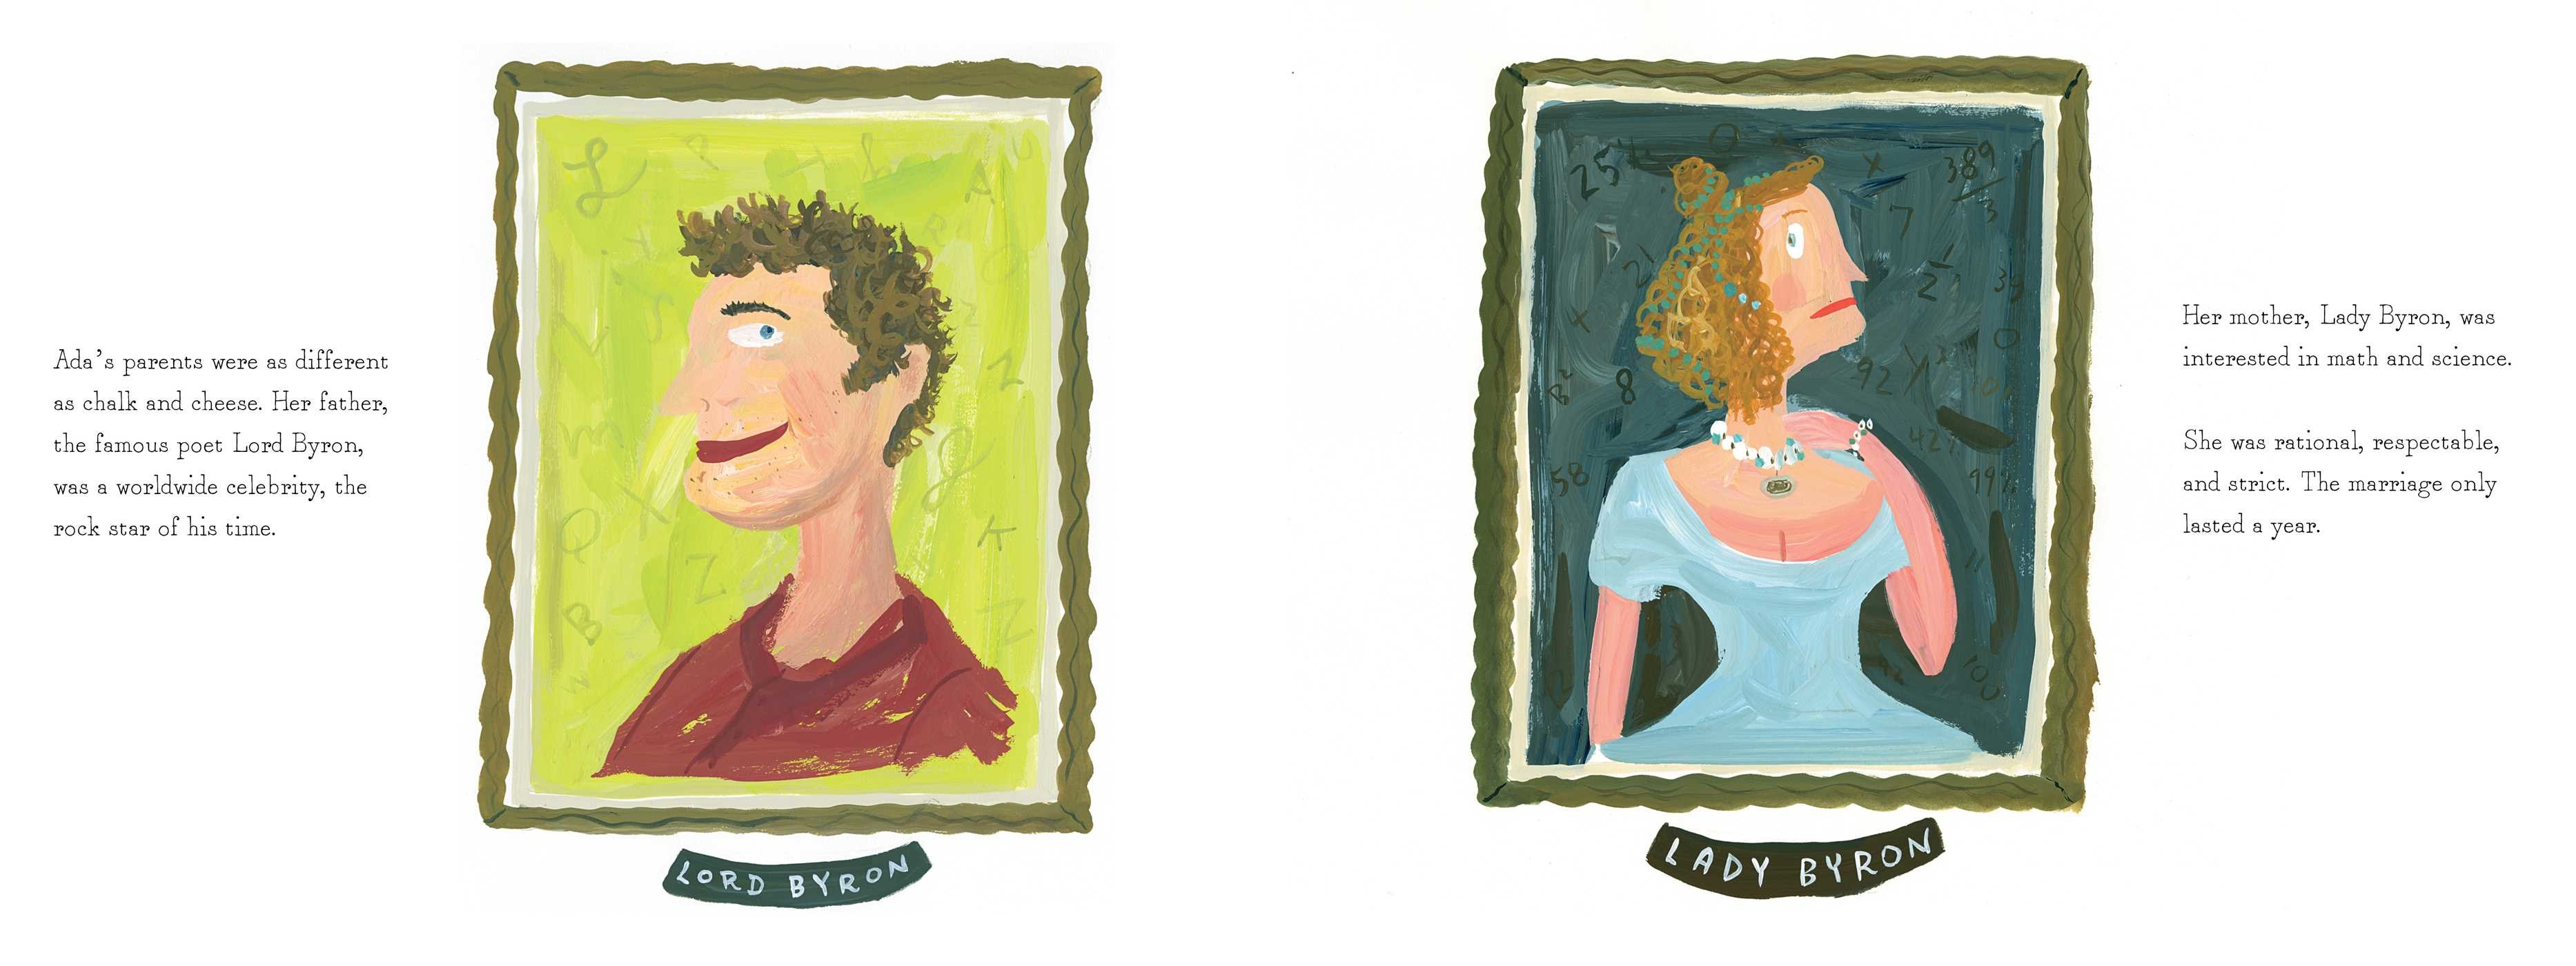 Ada lovelace poet of science 9781481452496.in03